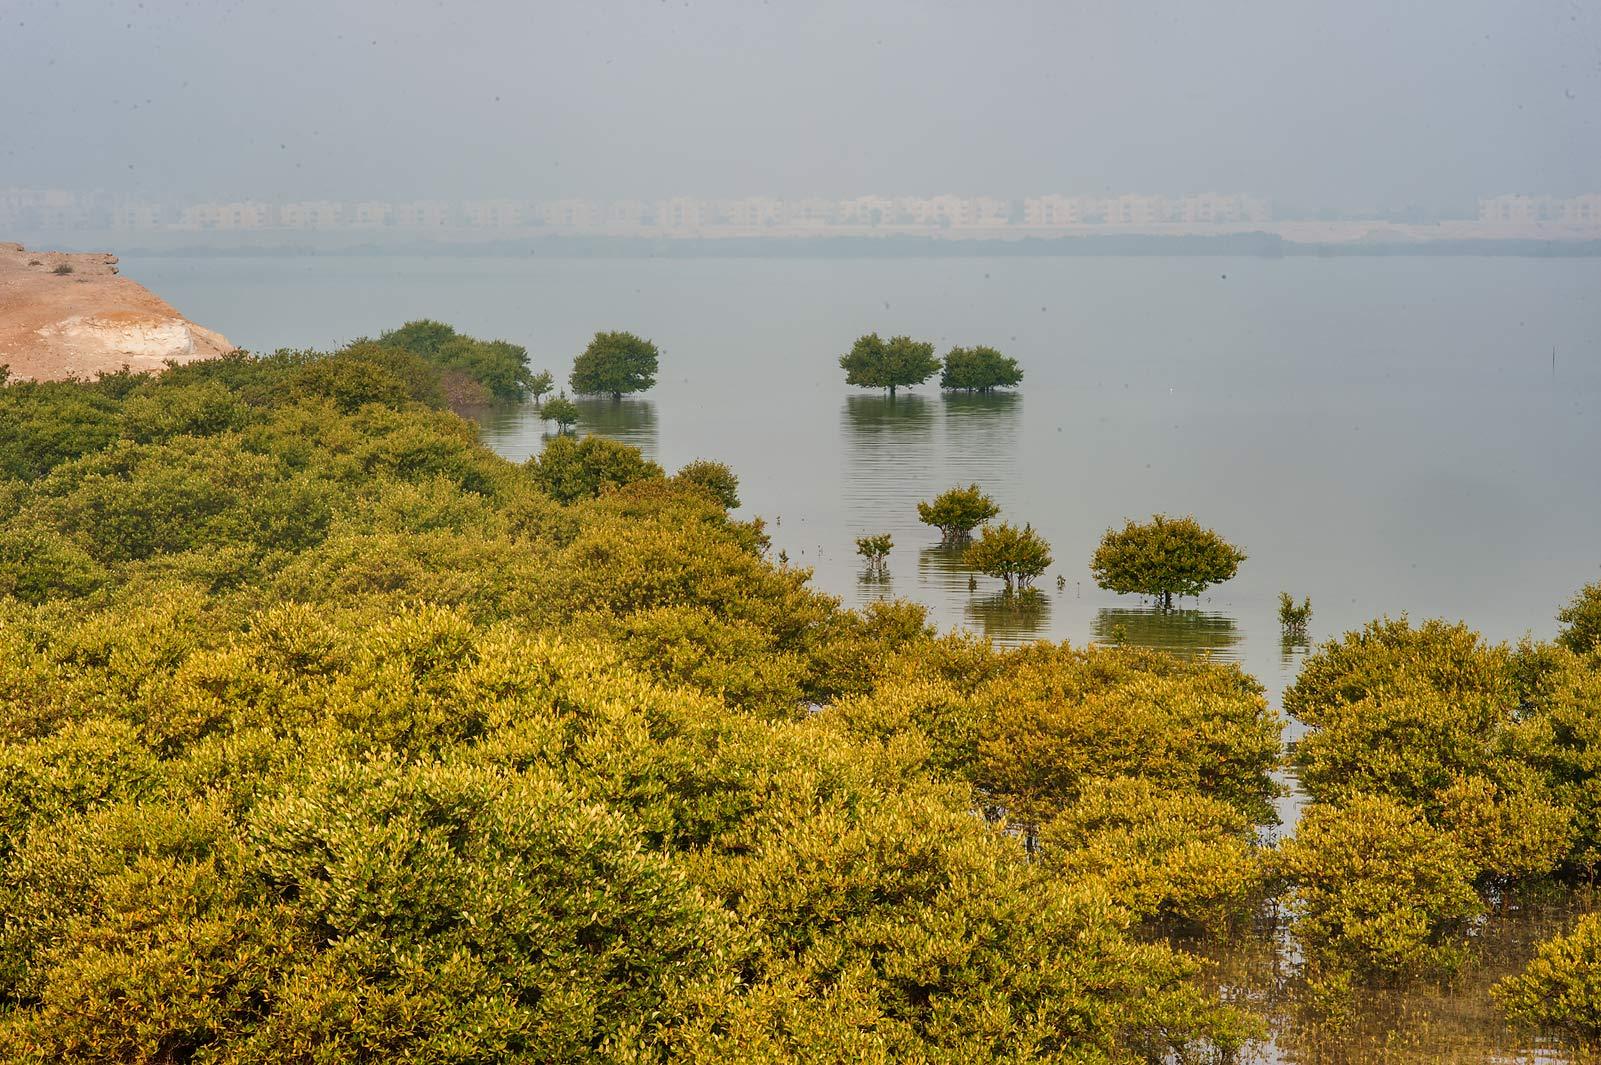 photo 917 13 mangrove forest avicennia marina near purple island jazirat bin ghanim al. Black Bedroom Furniture Sets. Home Design Ideas